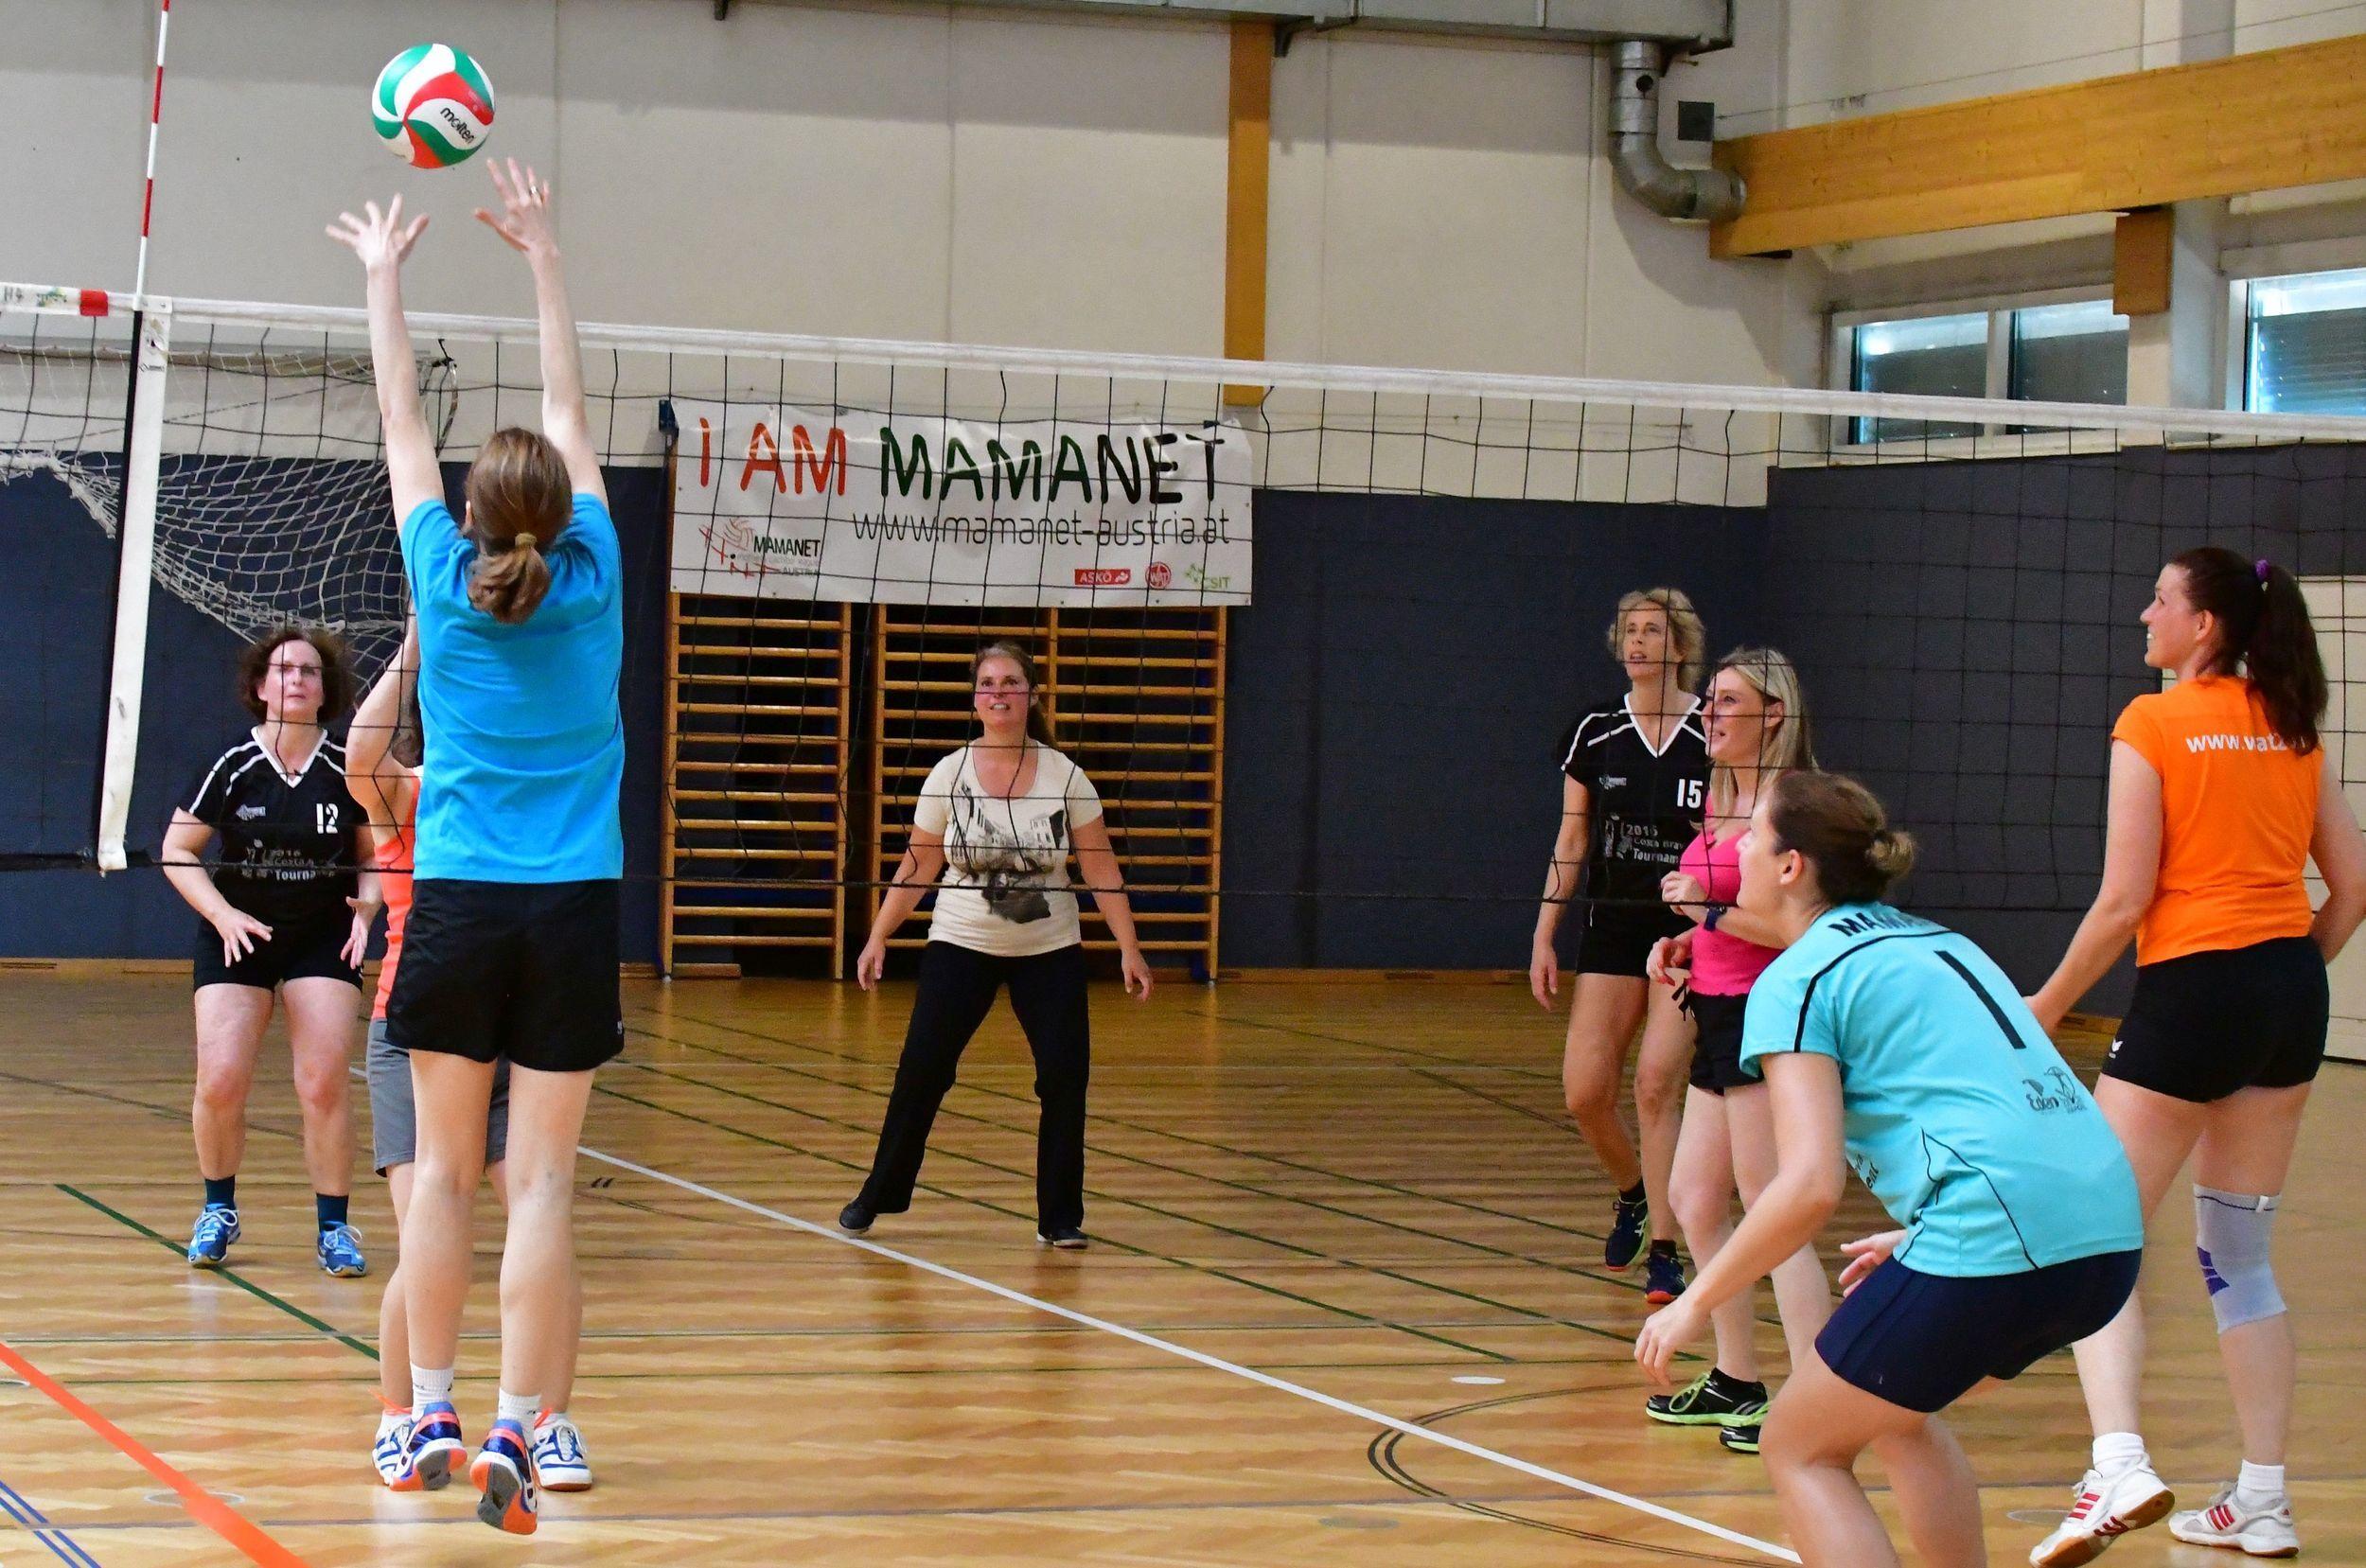 Aktuelle KURSE in Stockerau | Frauenakademie Pascalina